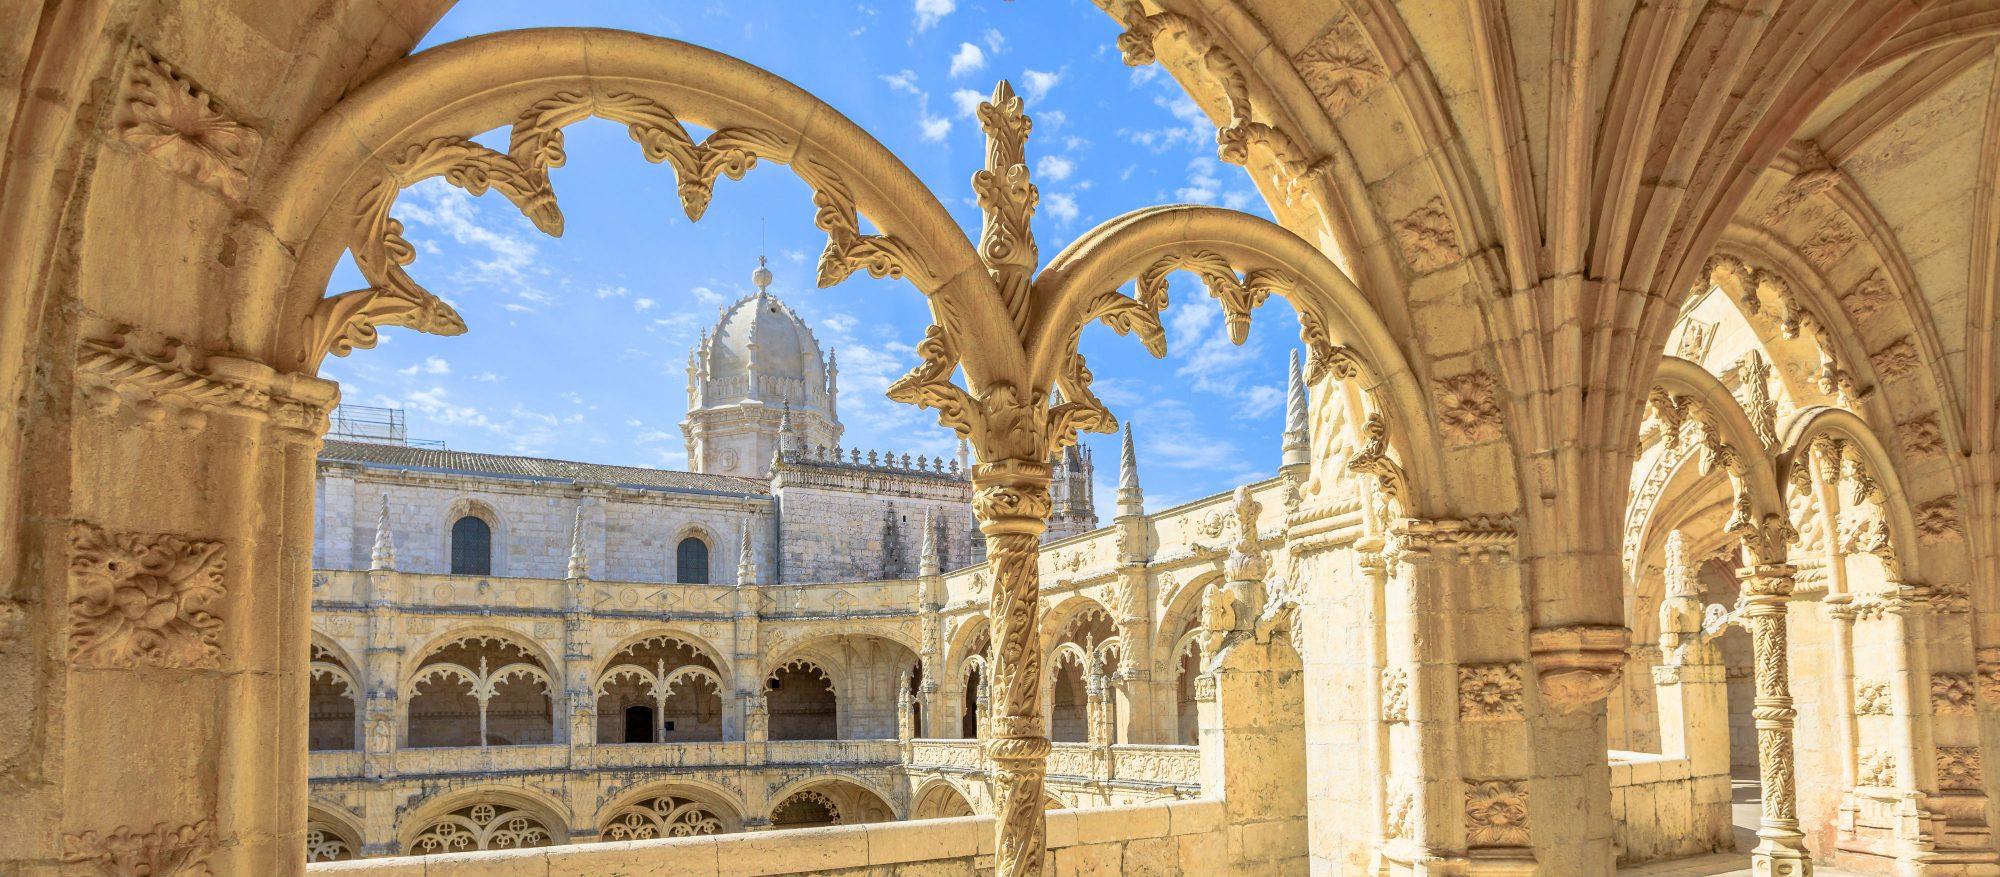 Mosteiro dos Jerónimos (Hiëronymietenklooster) - Lissabon